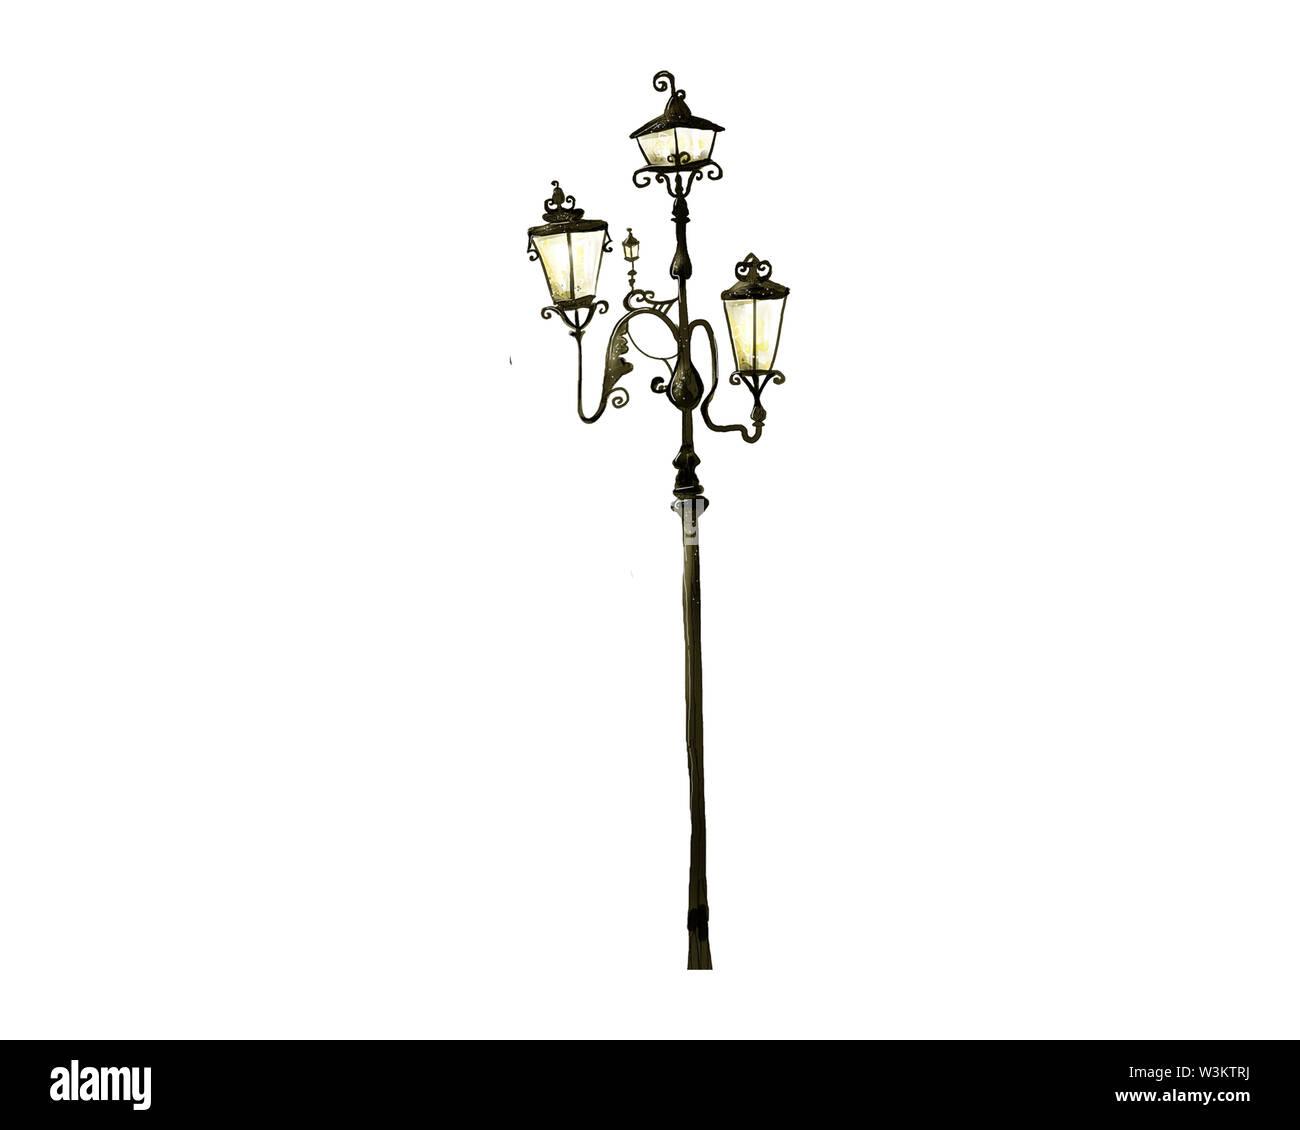 retro vintage street lamp isolated on white background Stock Photo